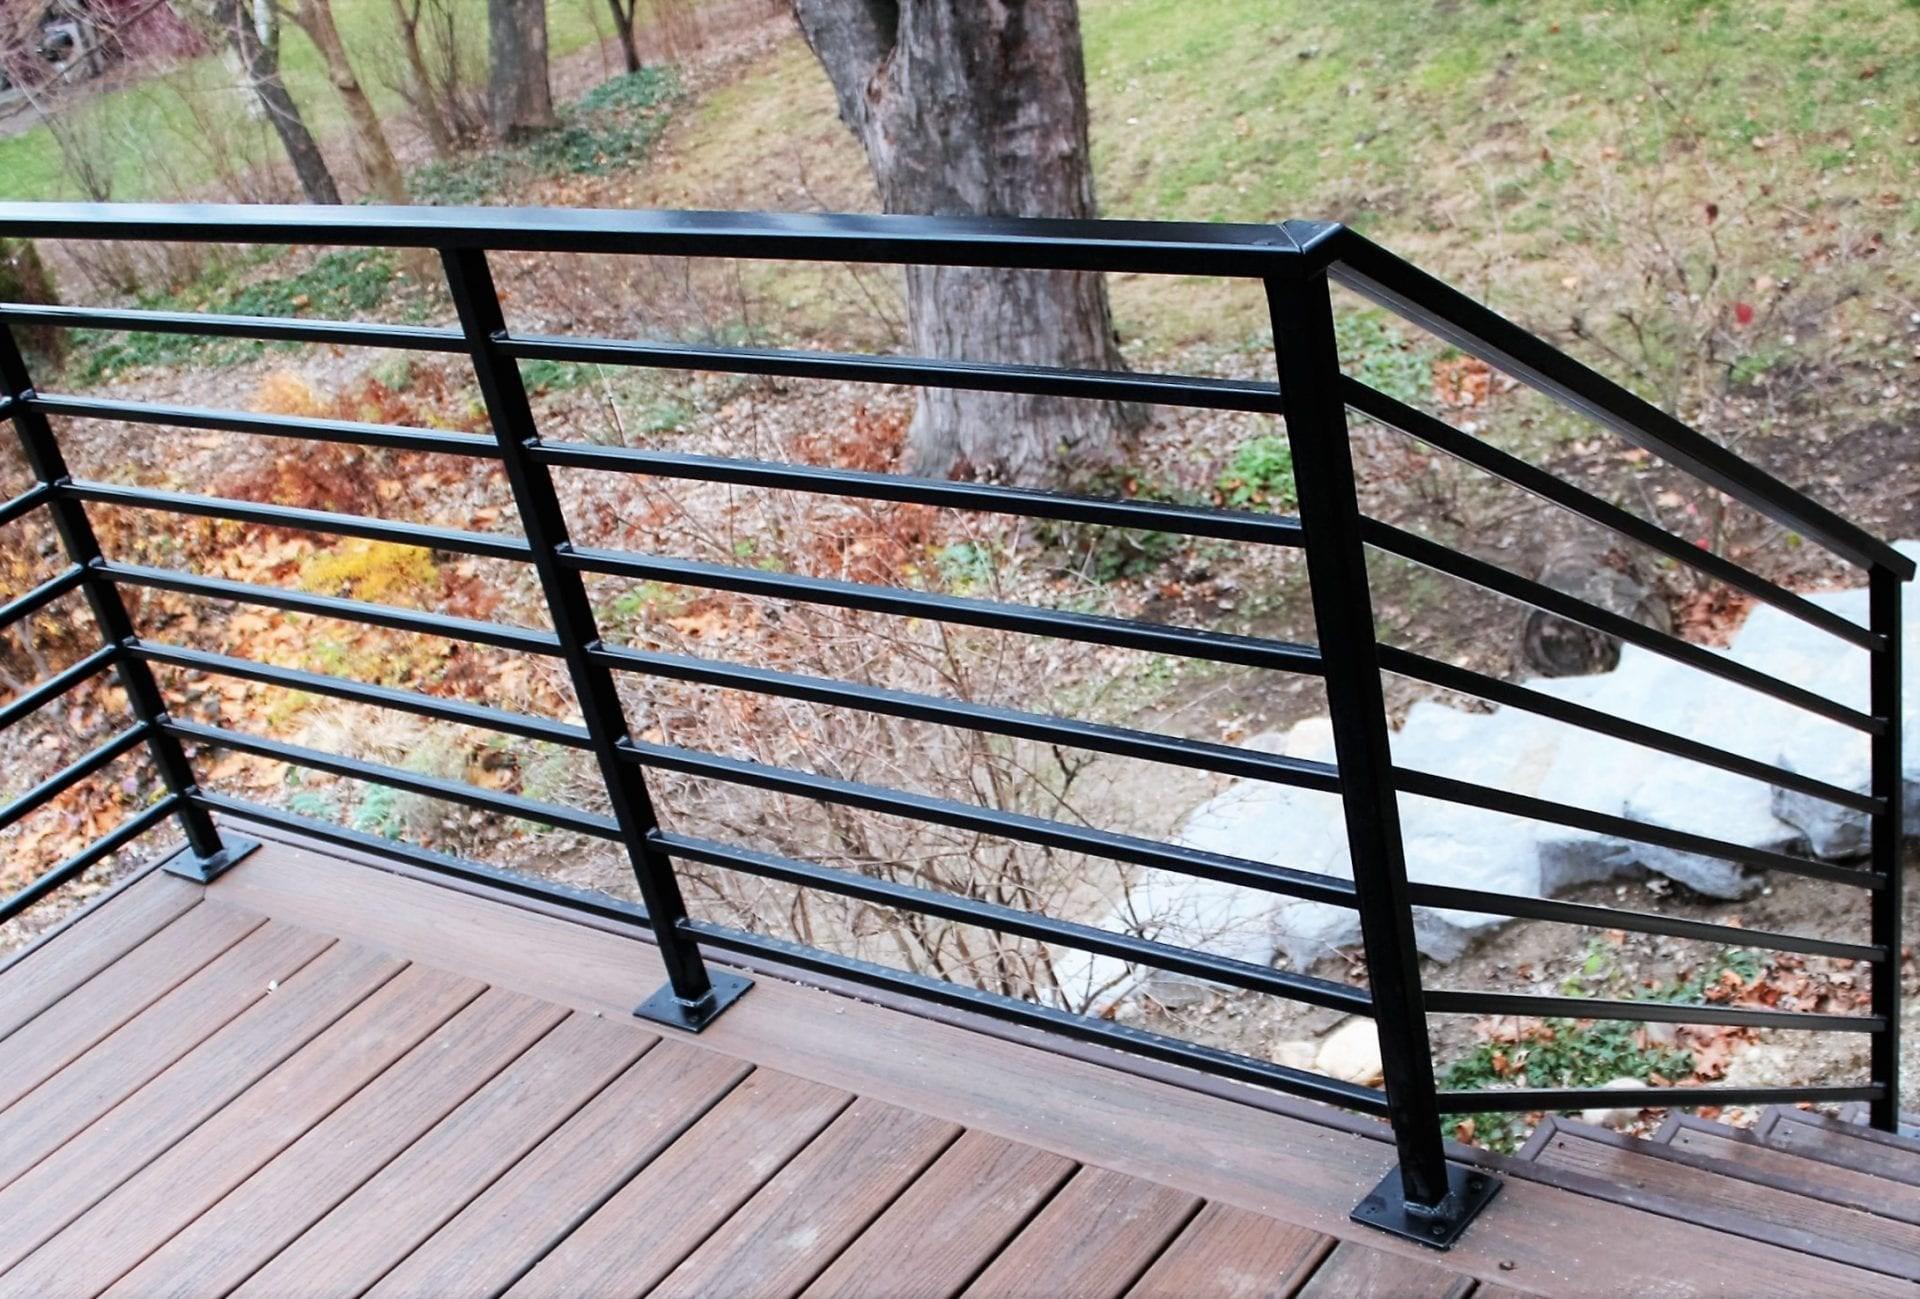 Horizontal Metal Railing For Deck Great Lakes Metal Fabrication | Modern Black Metal Stair Railing | Balcony | Really Thin | Outdoor | Metal Mesh | Dark Wood